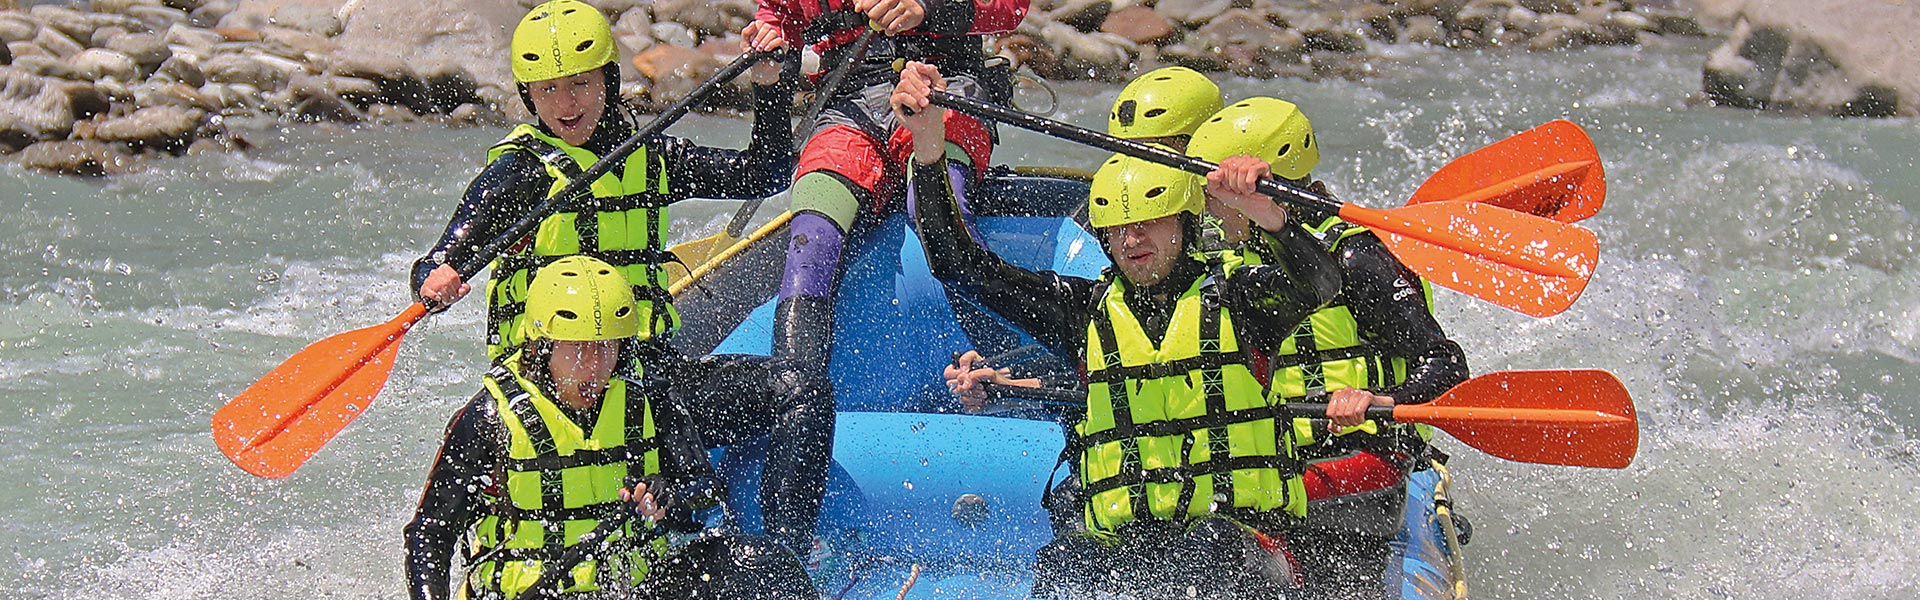 Rafting_Lienz_Osttirol